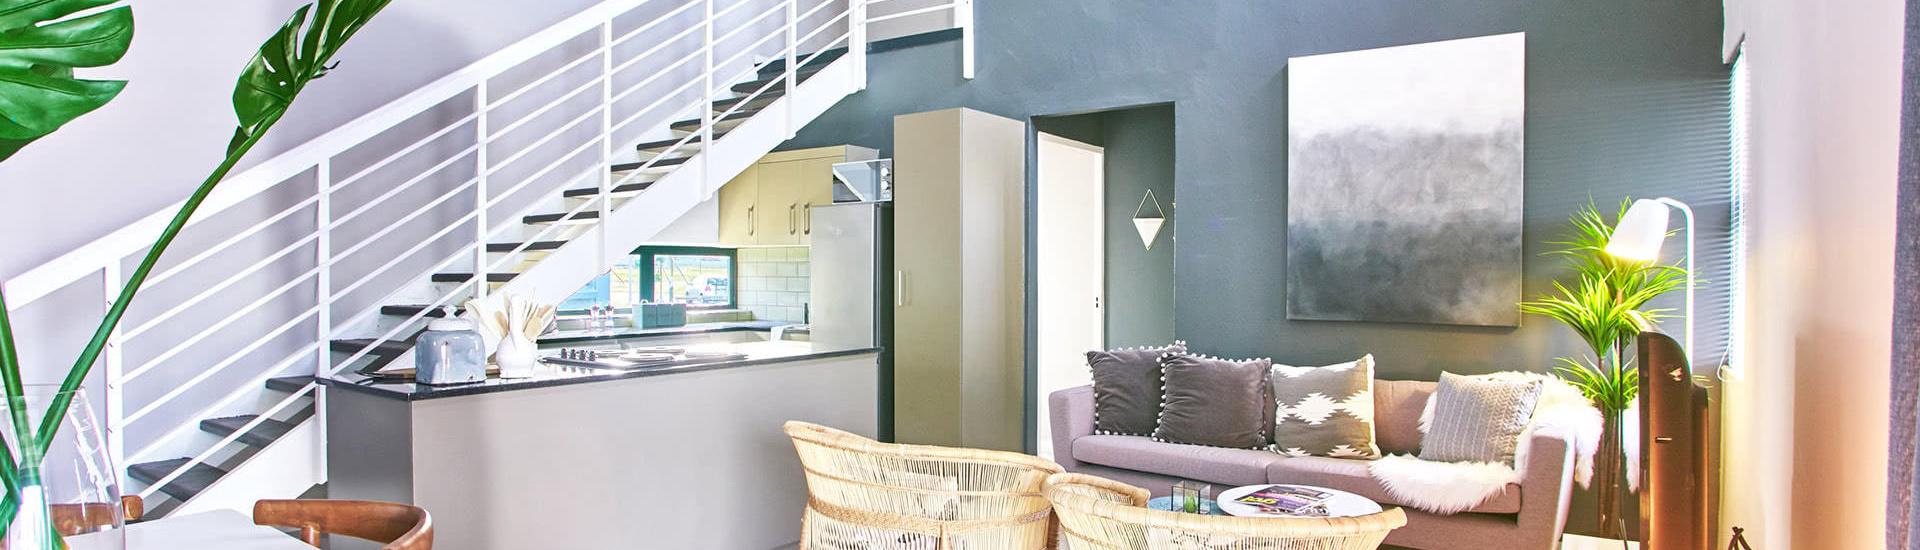 Housing,House,1001